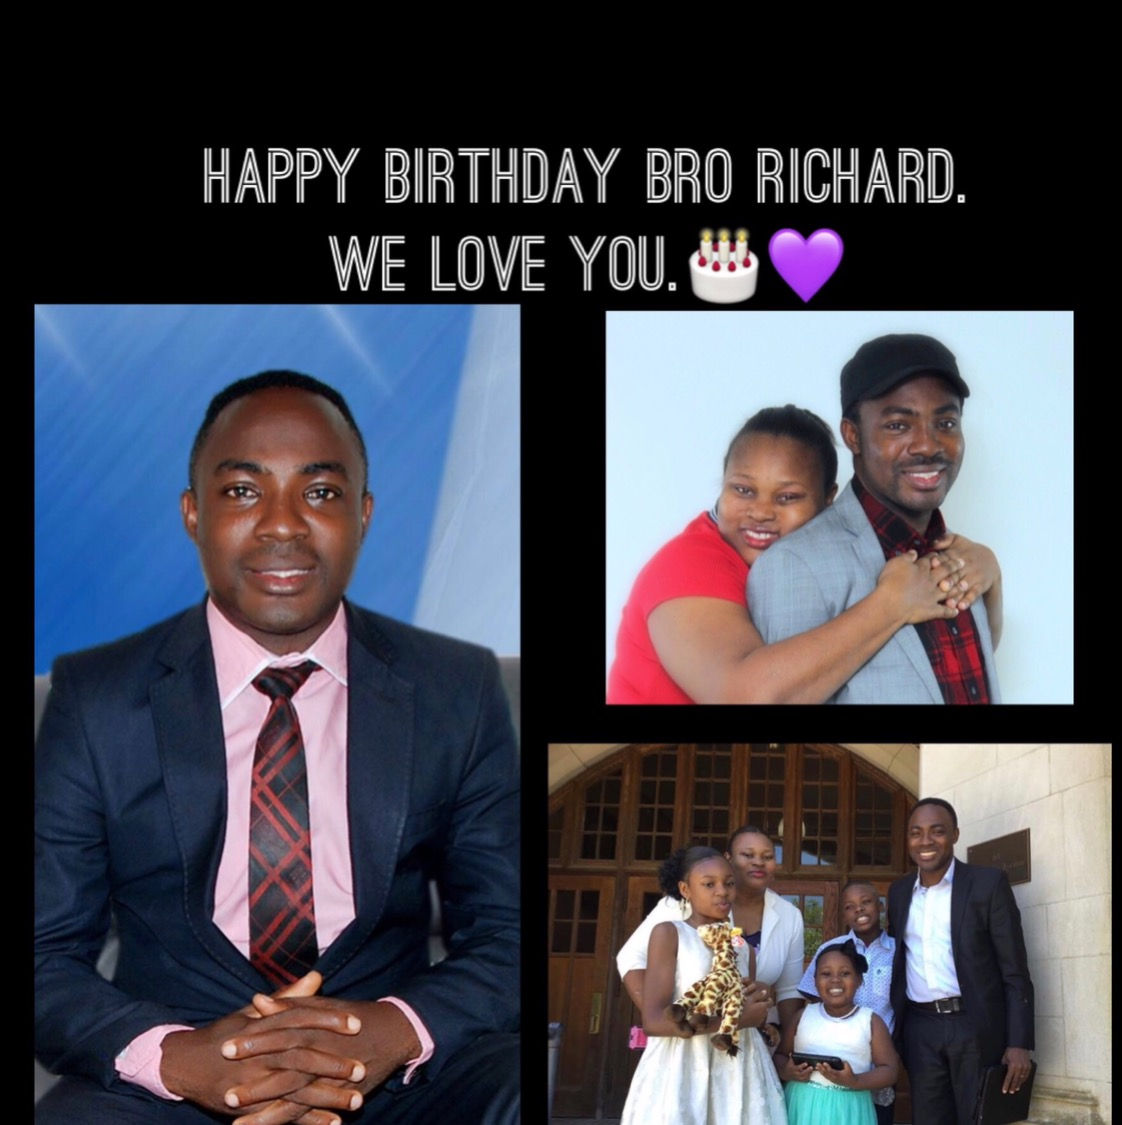 HBD Bro Richard, We